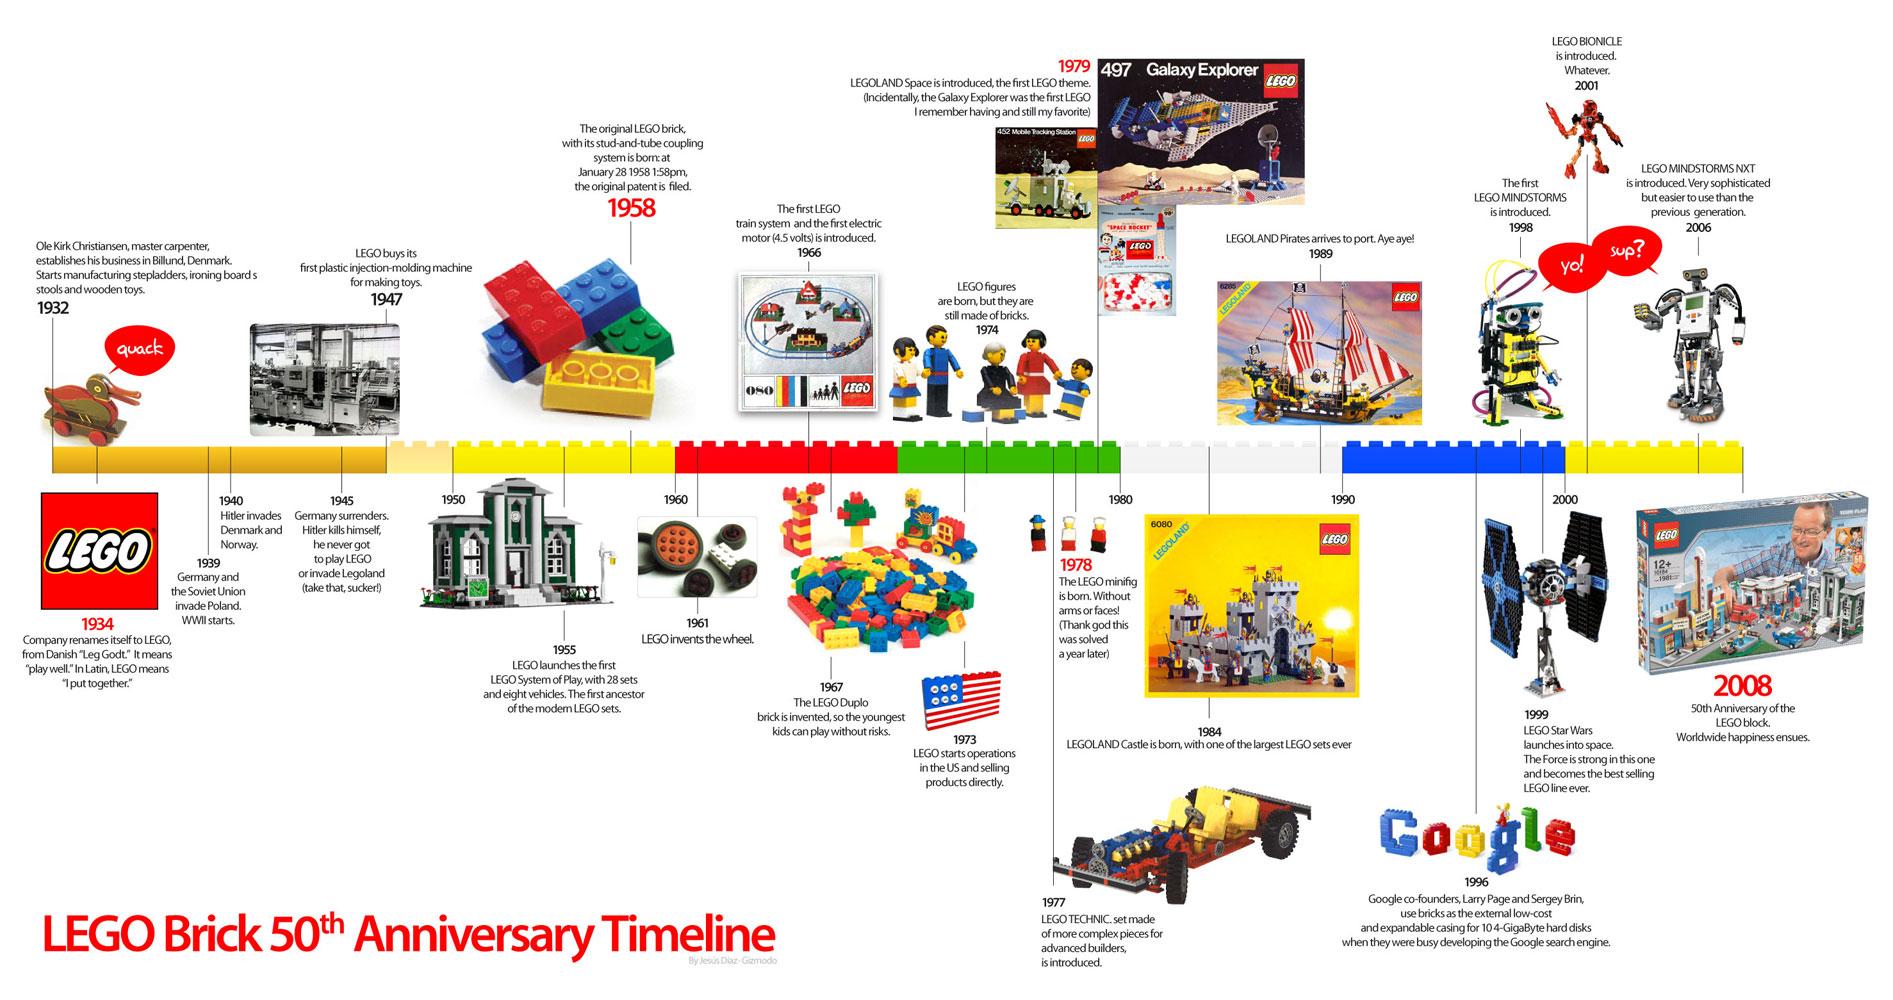 https://i1.wp.com/www.props.eric-hart.com/wp-content/uploads/2010/04/lego-brick4-timeline.jpg